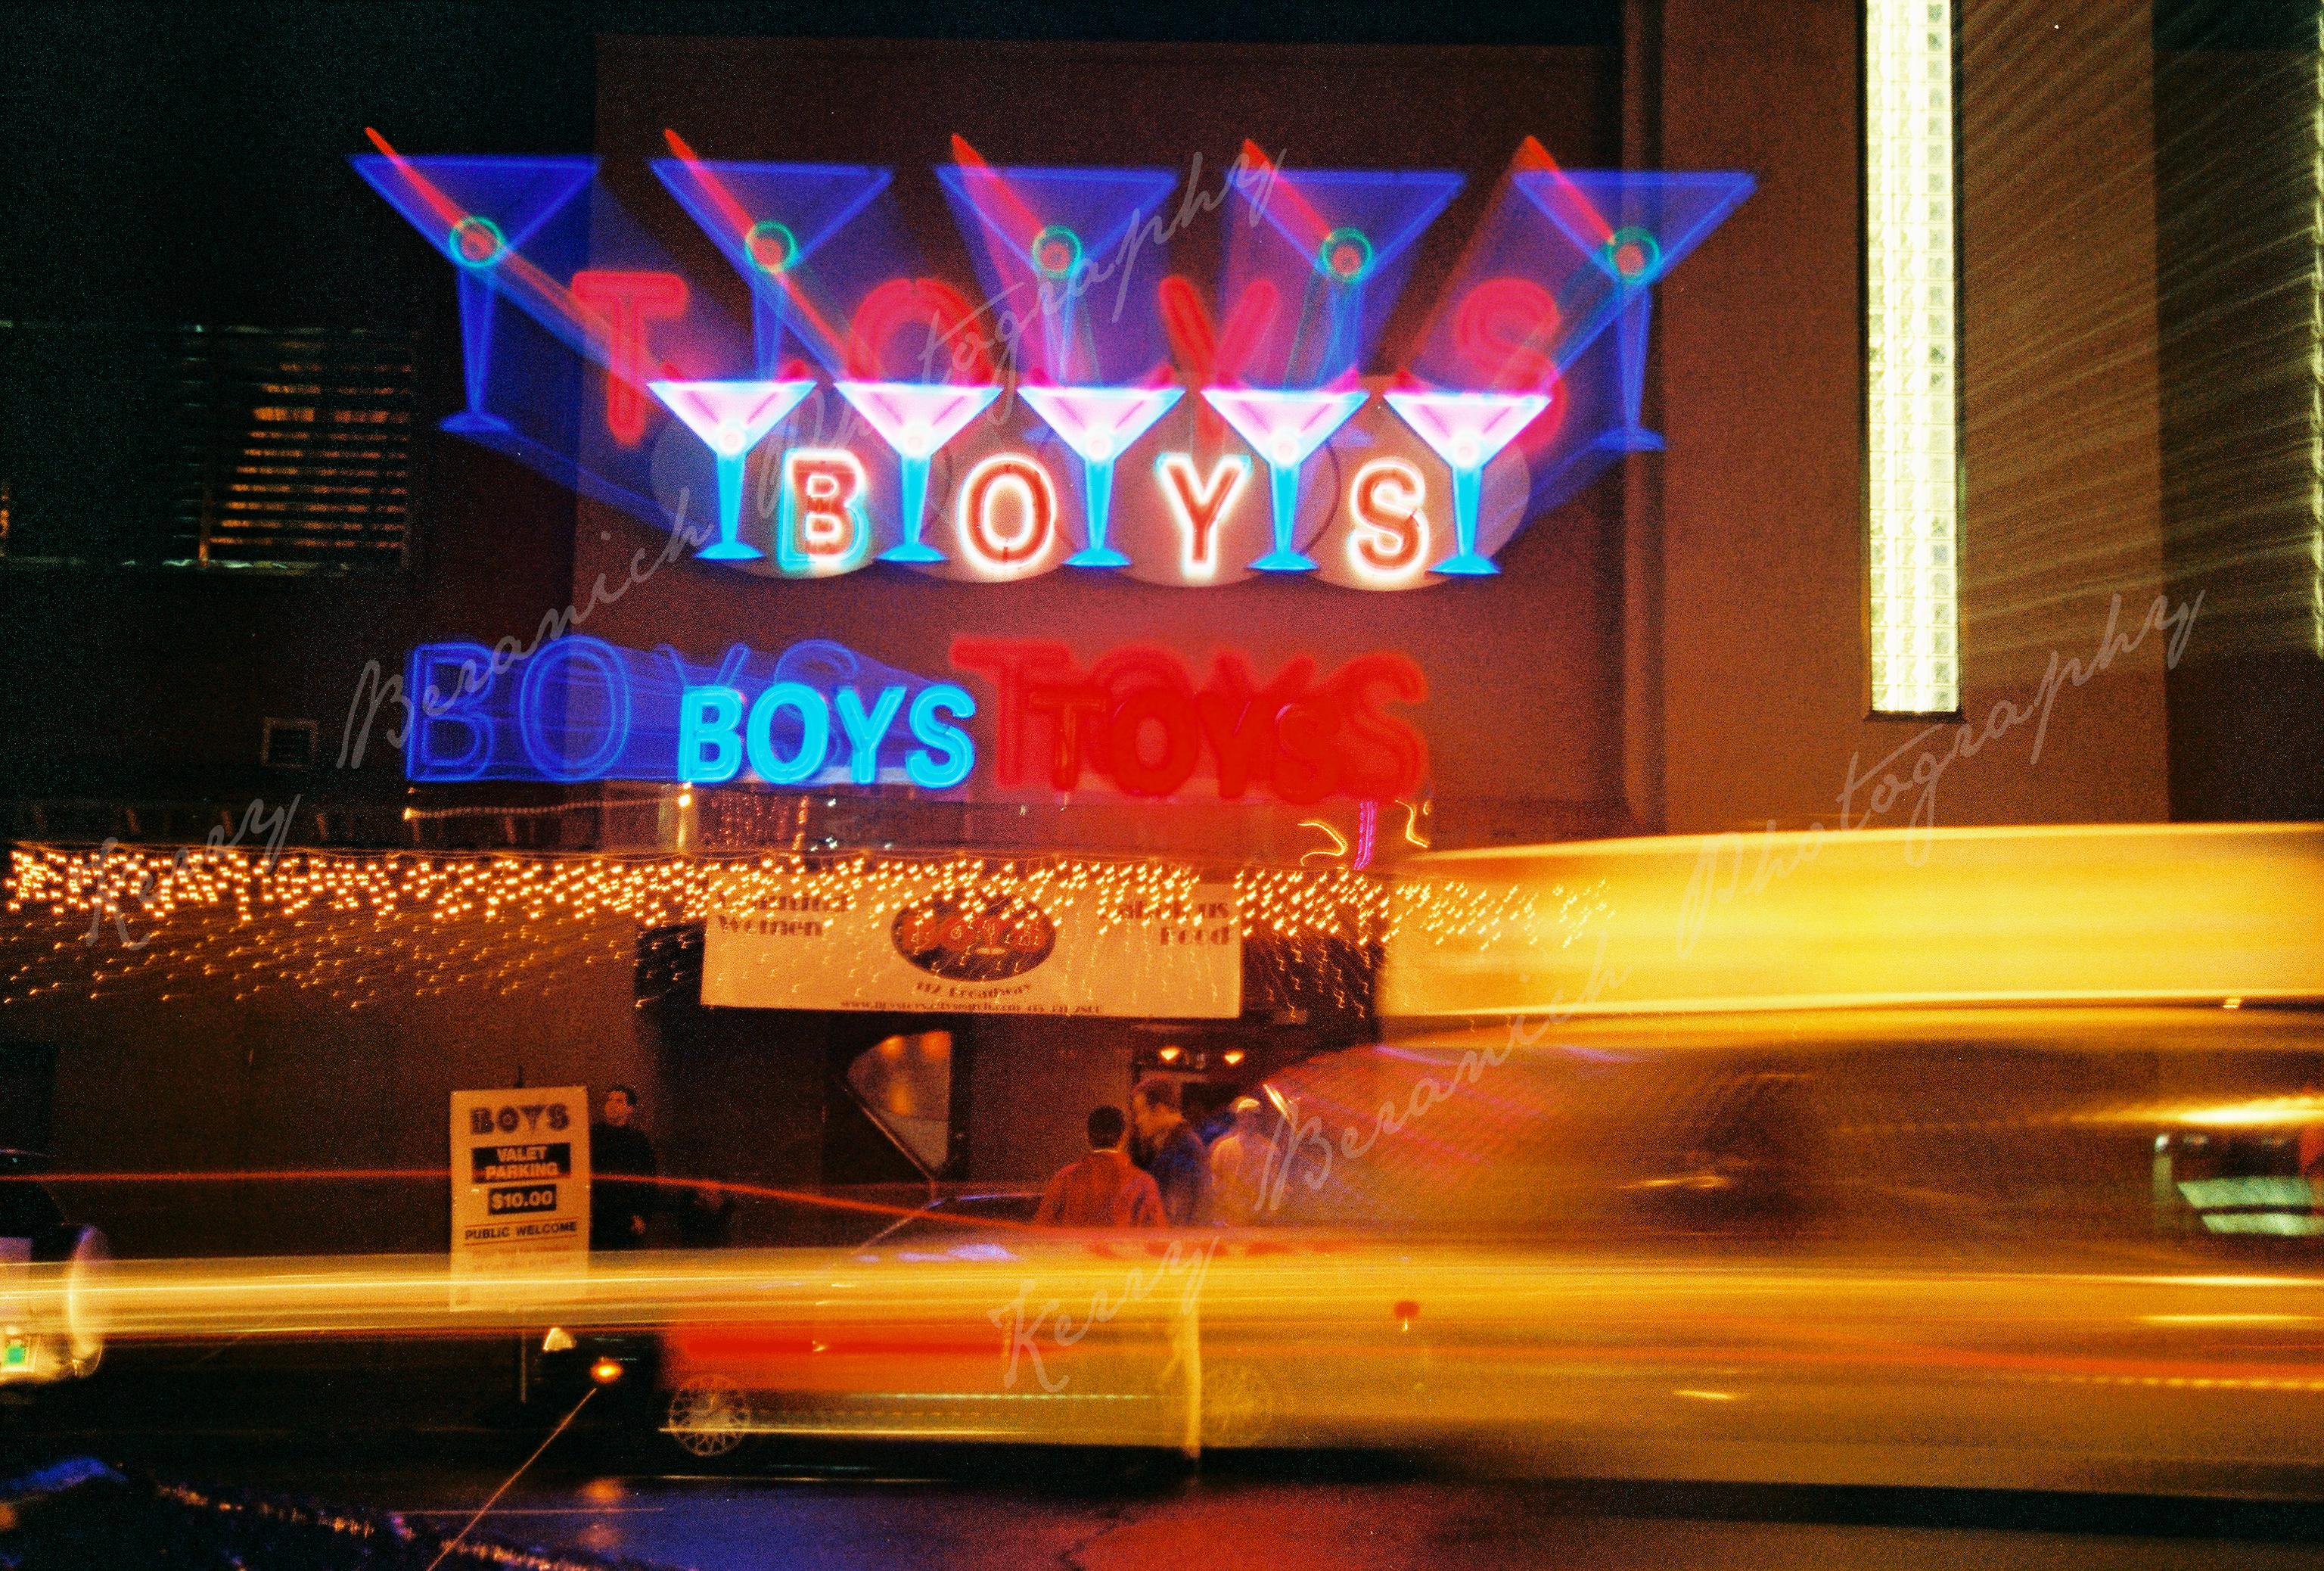 Boys Toys watermark